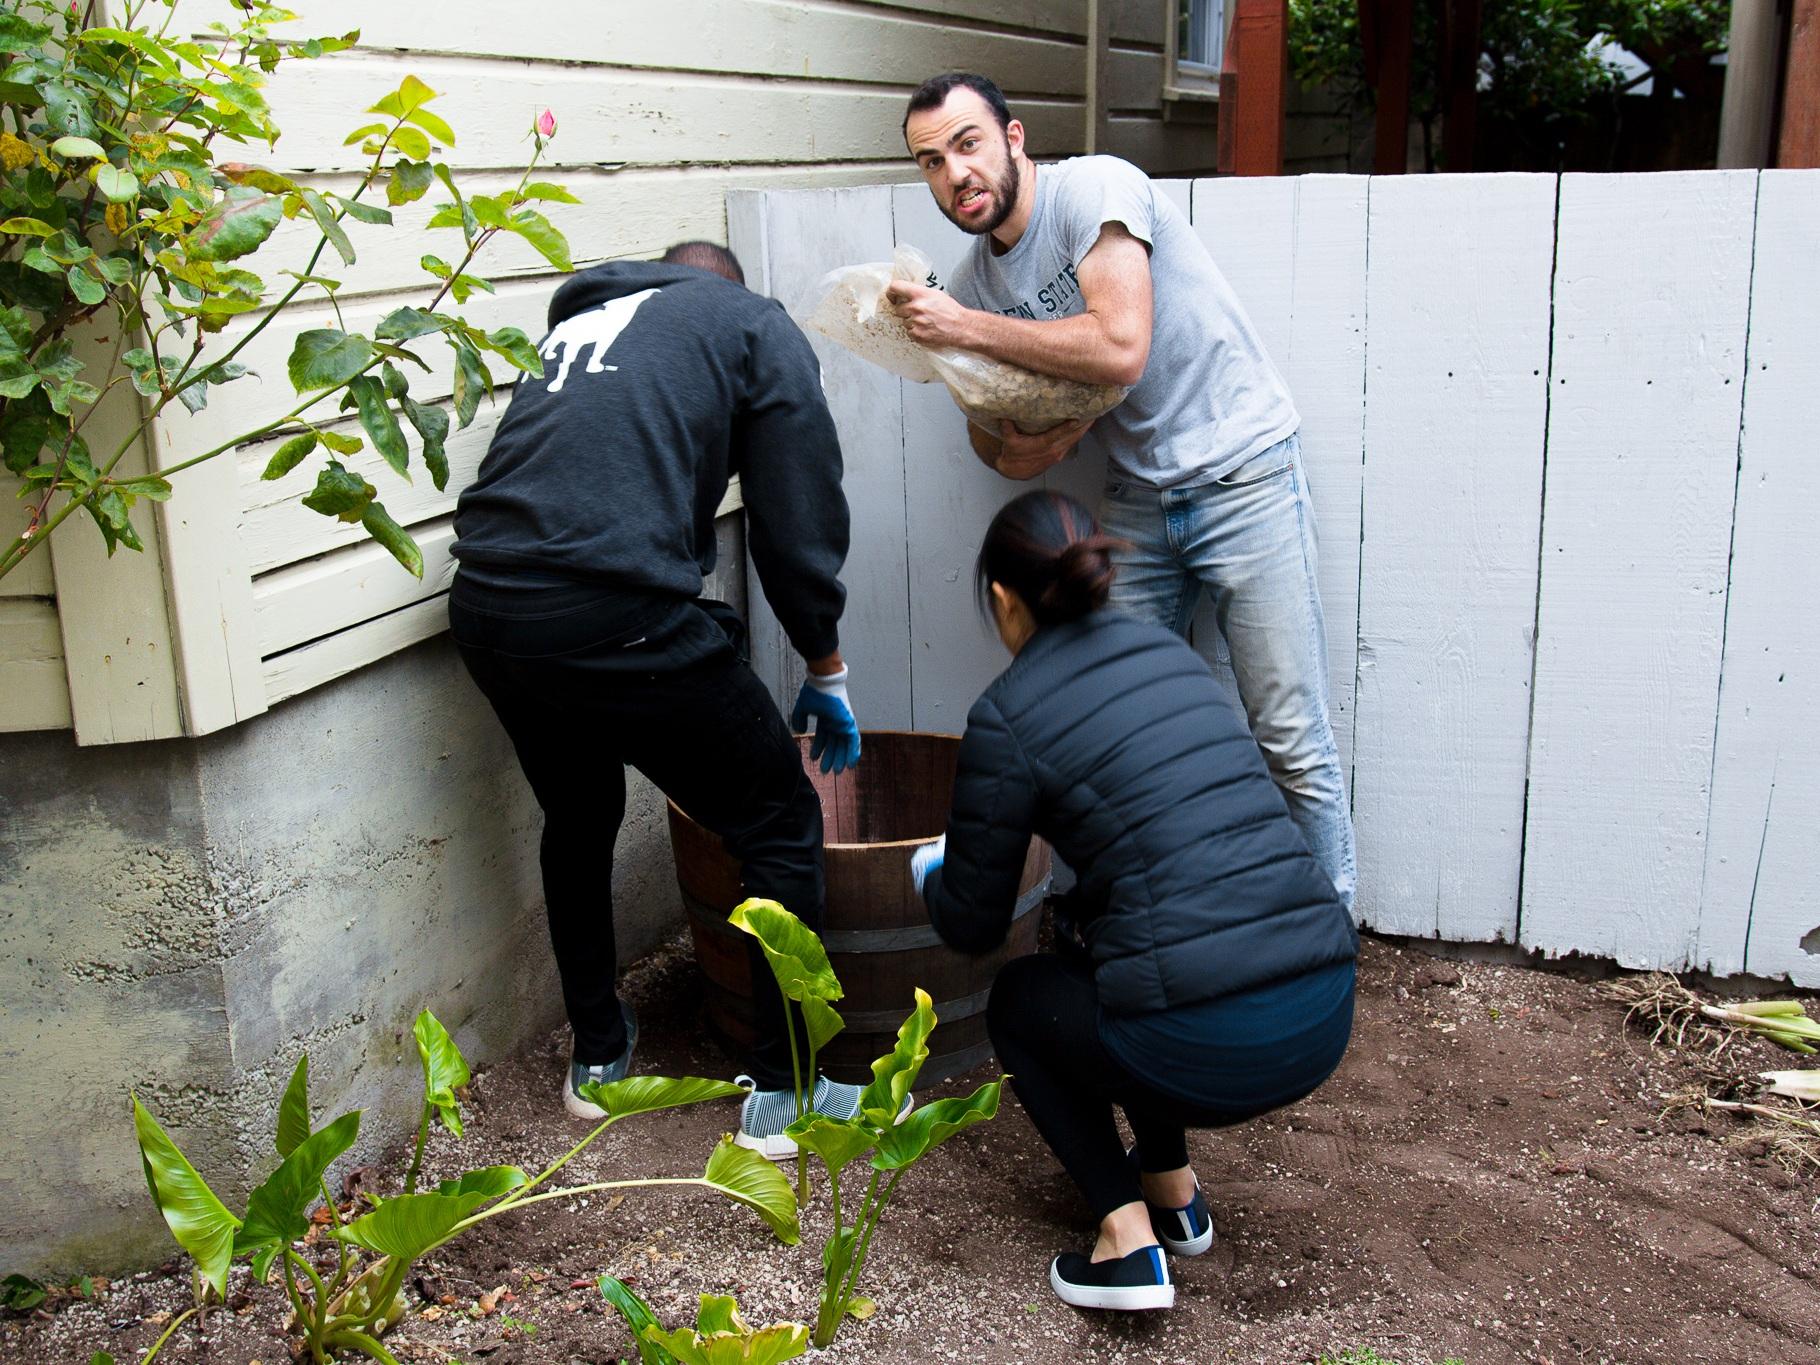 Planting things